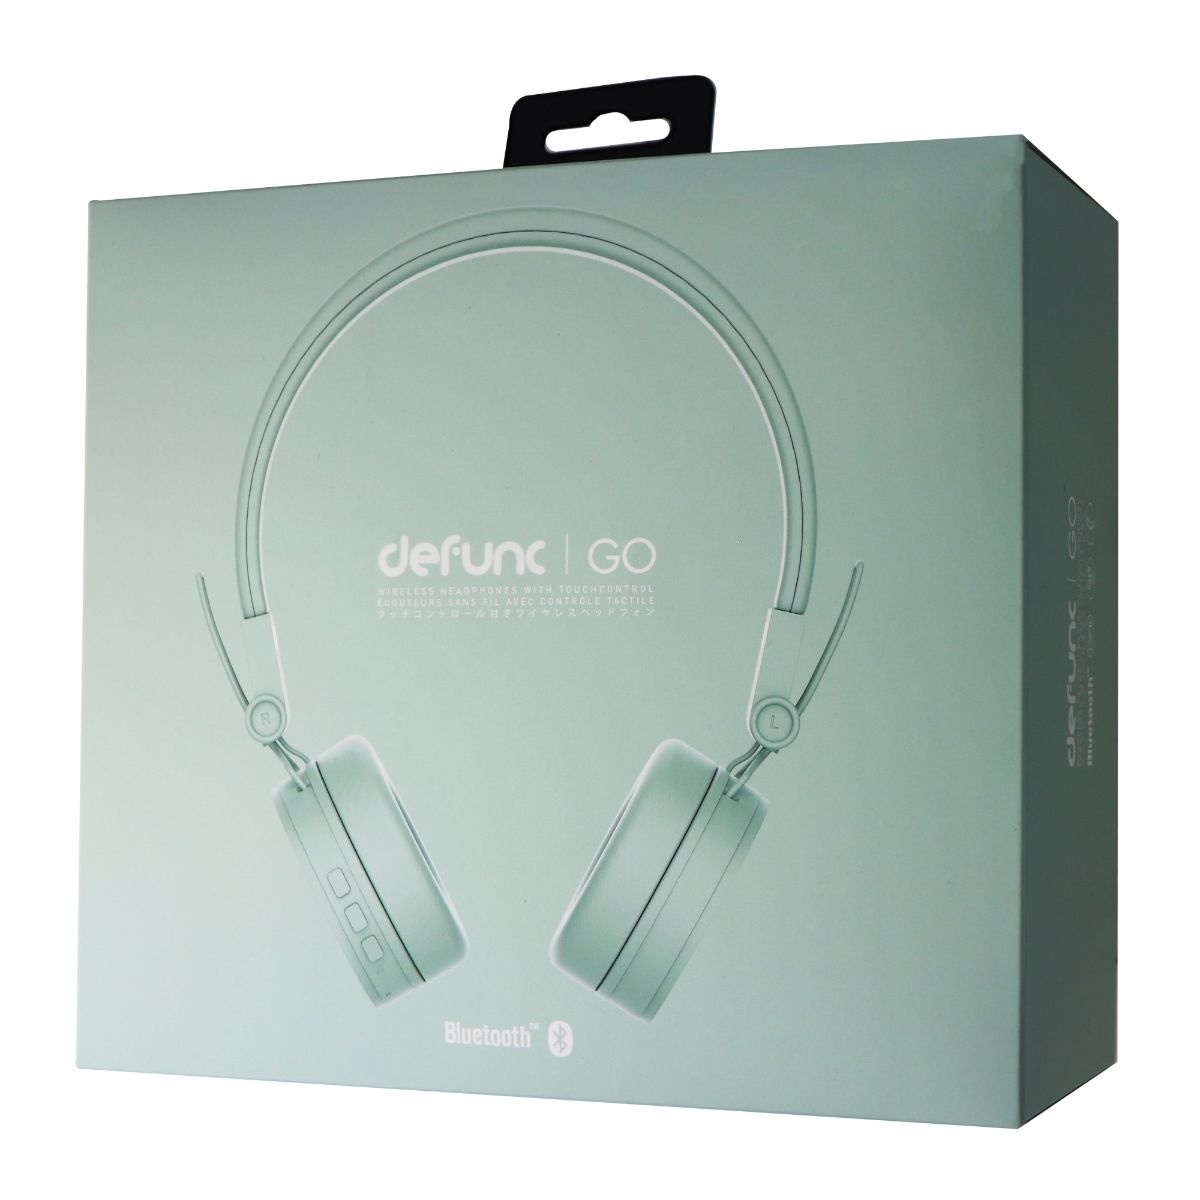 Defunc GO D1138 Wireless Headphones w/ Touch Control - Light Green